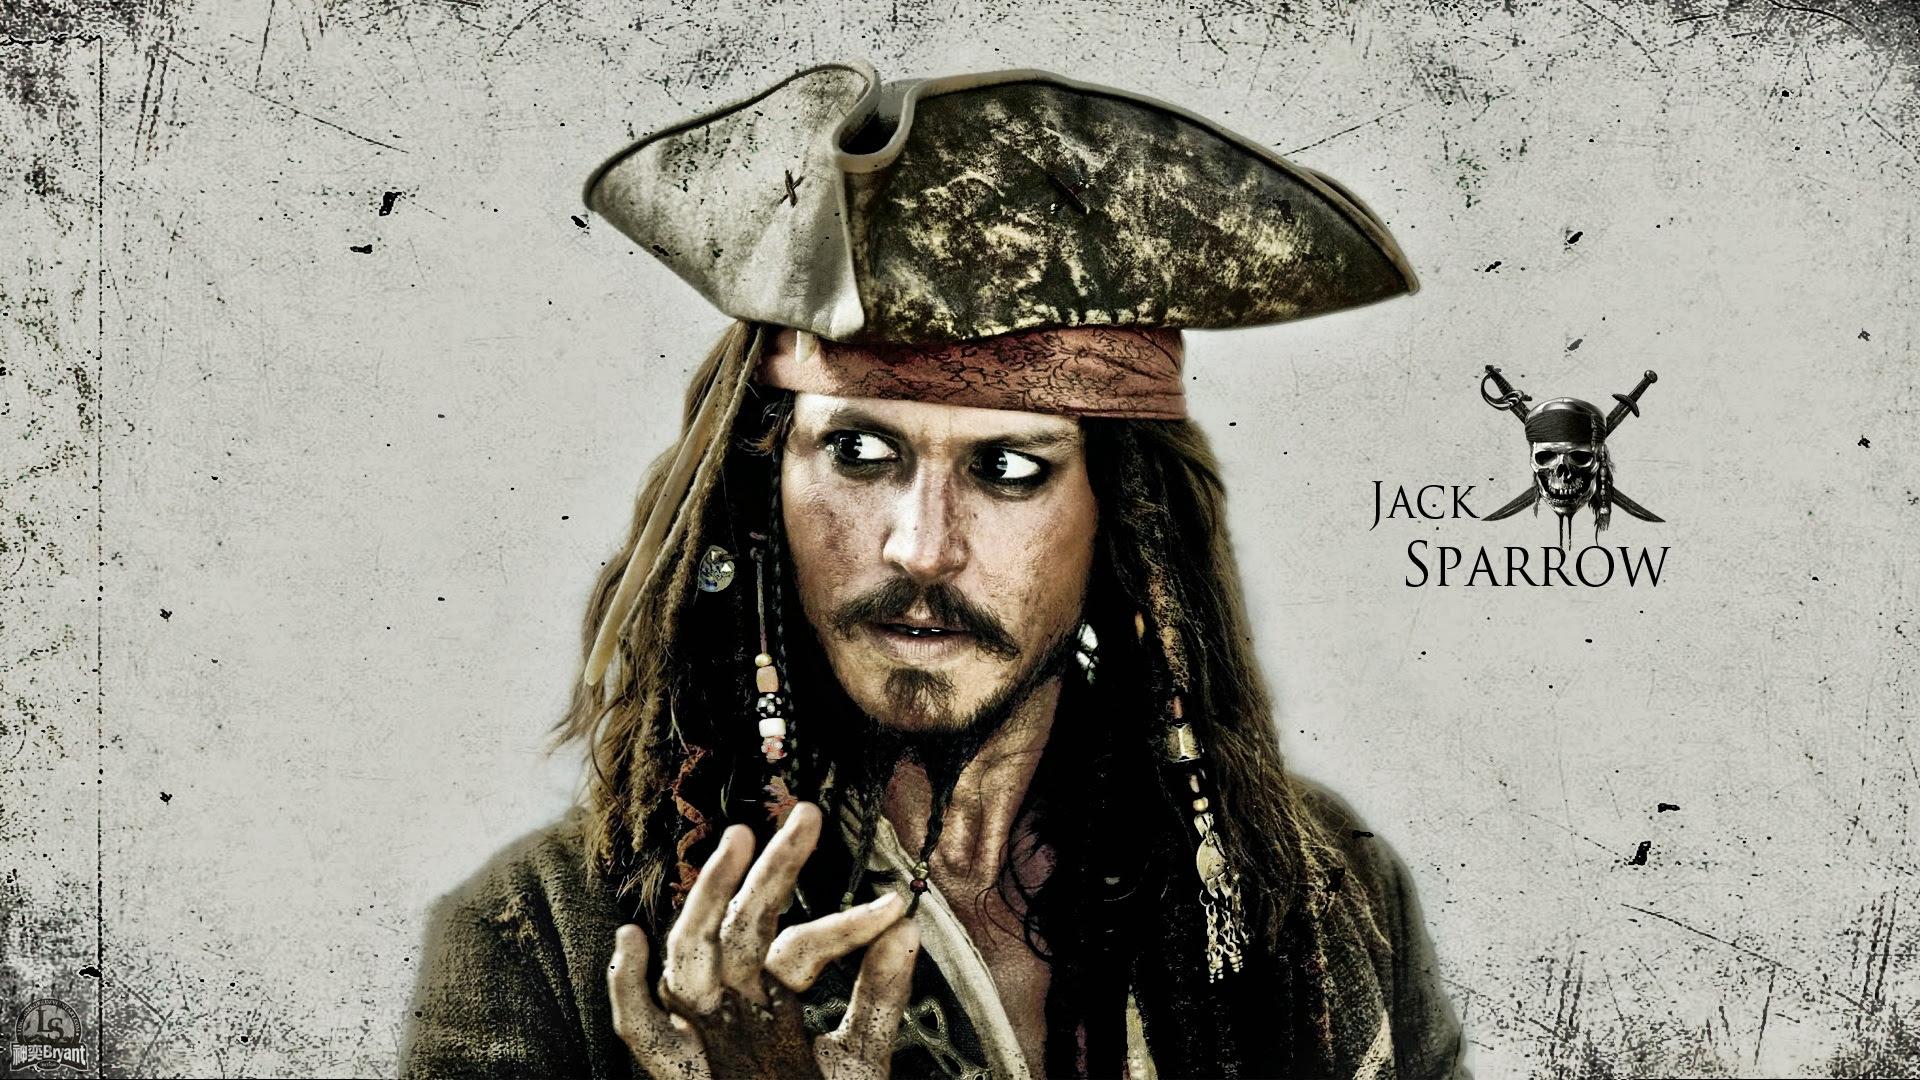 Captain Jack Sparrow ジャック スパロウ 壁紙 33625293